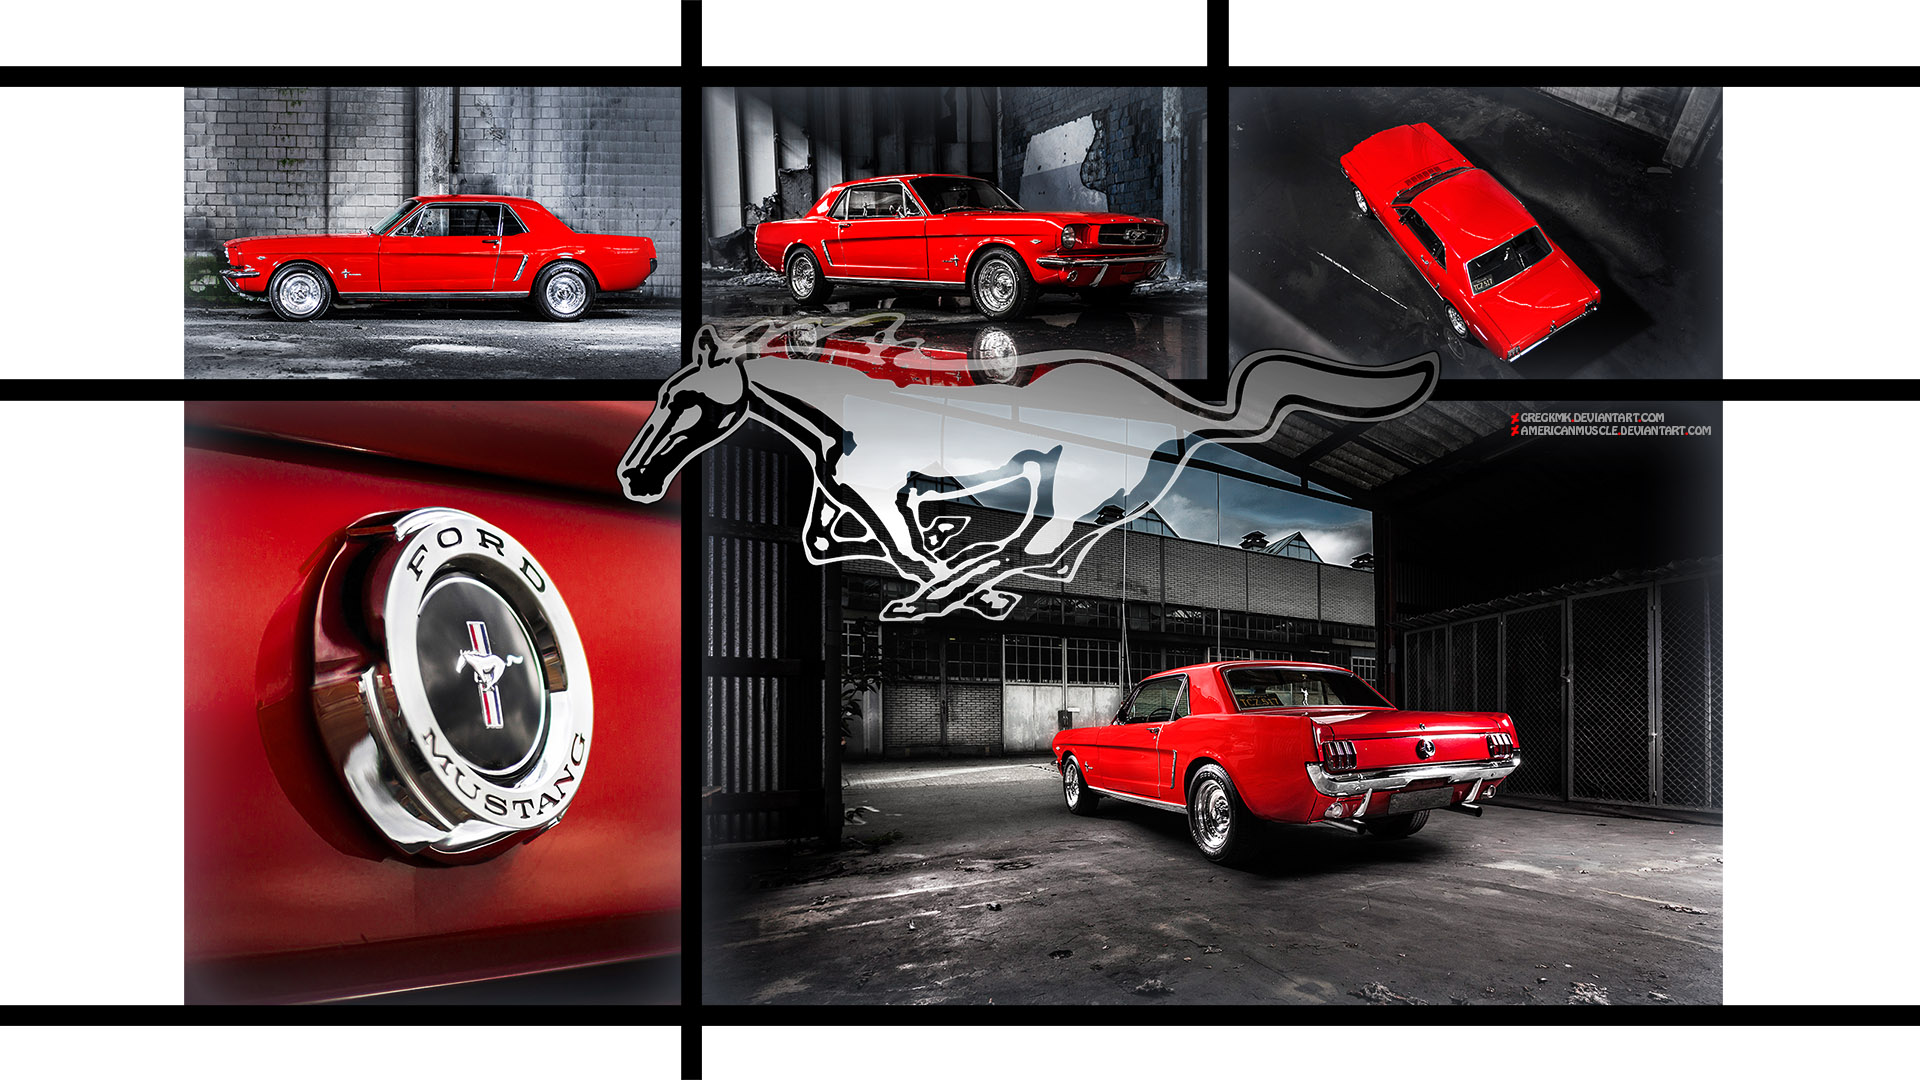 Red Mustang Wallpaper by GregKmk